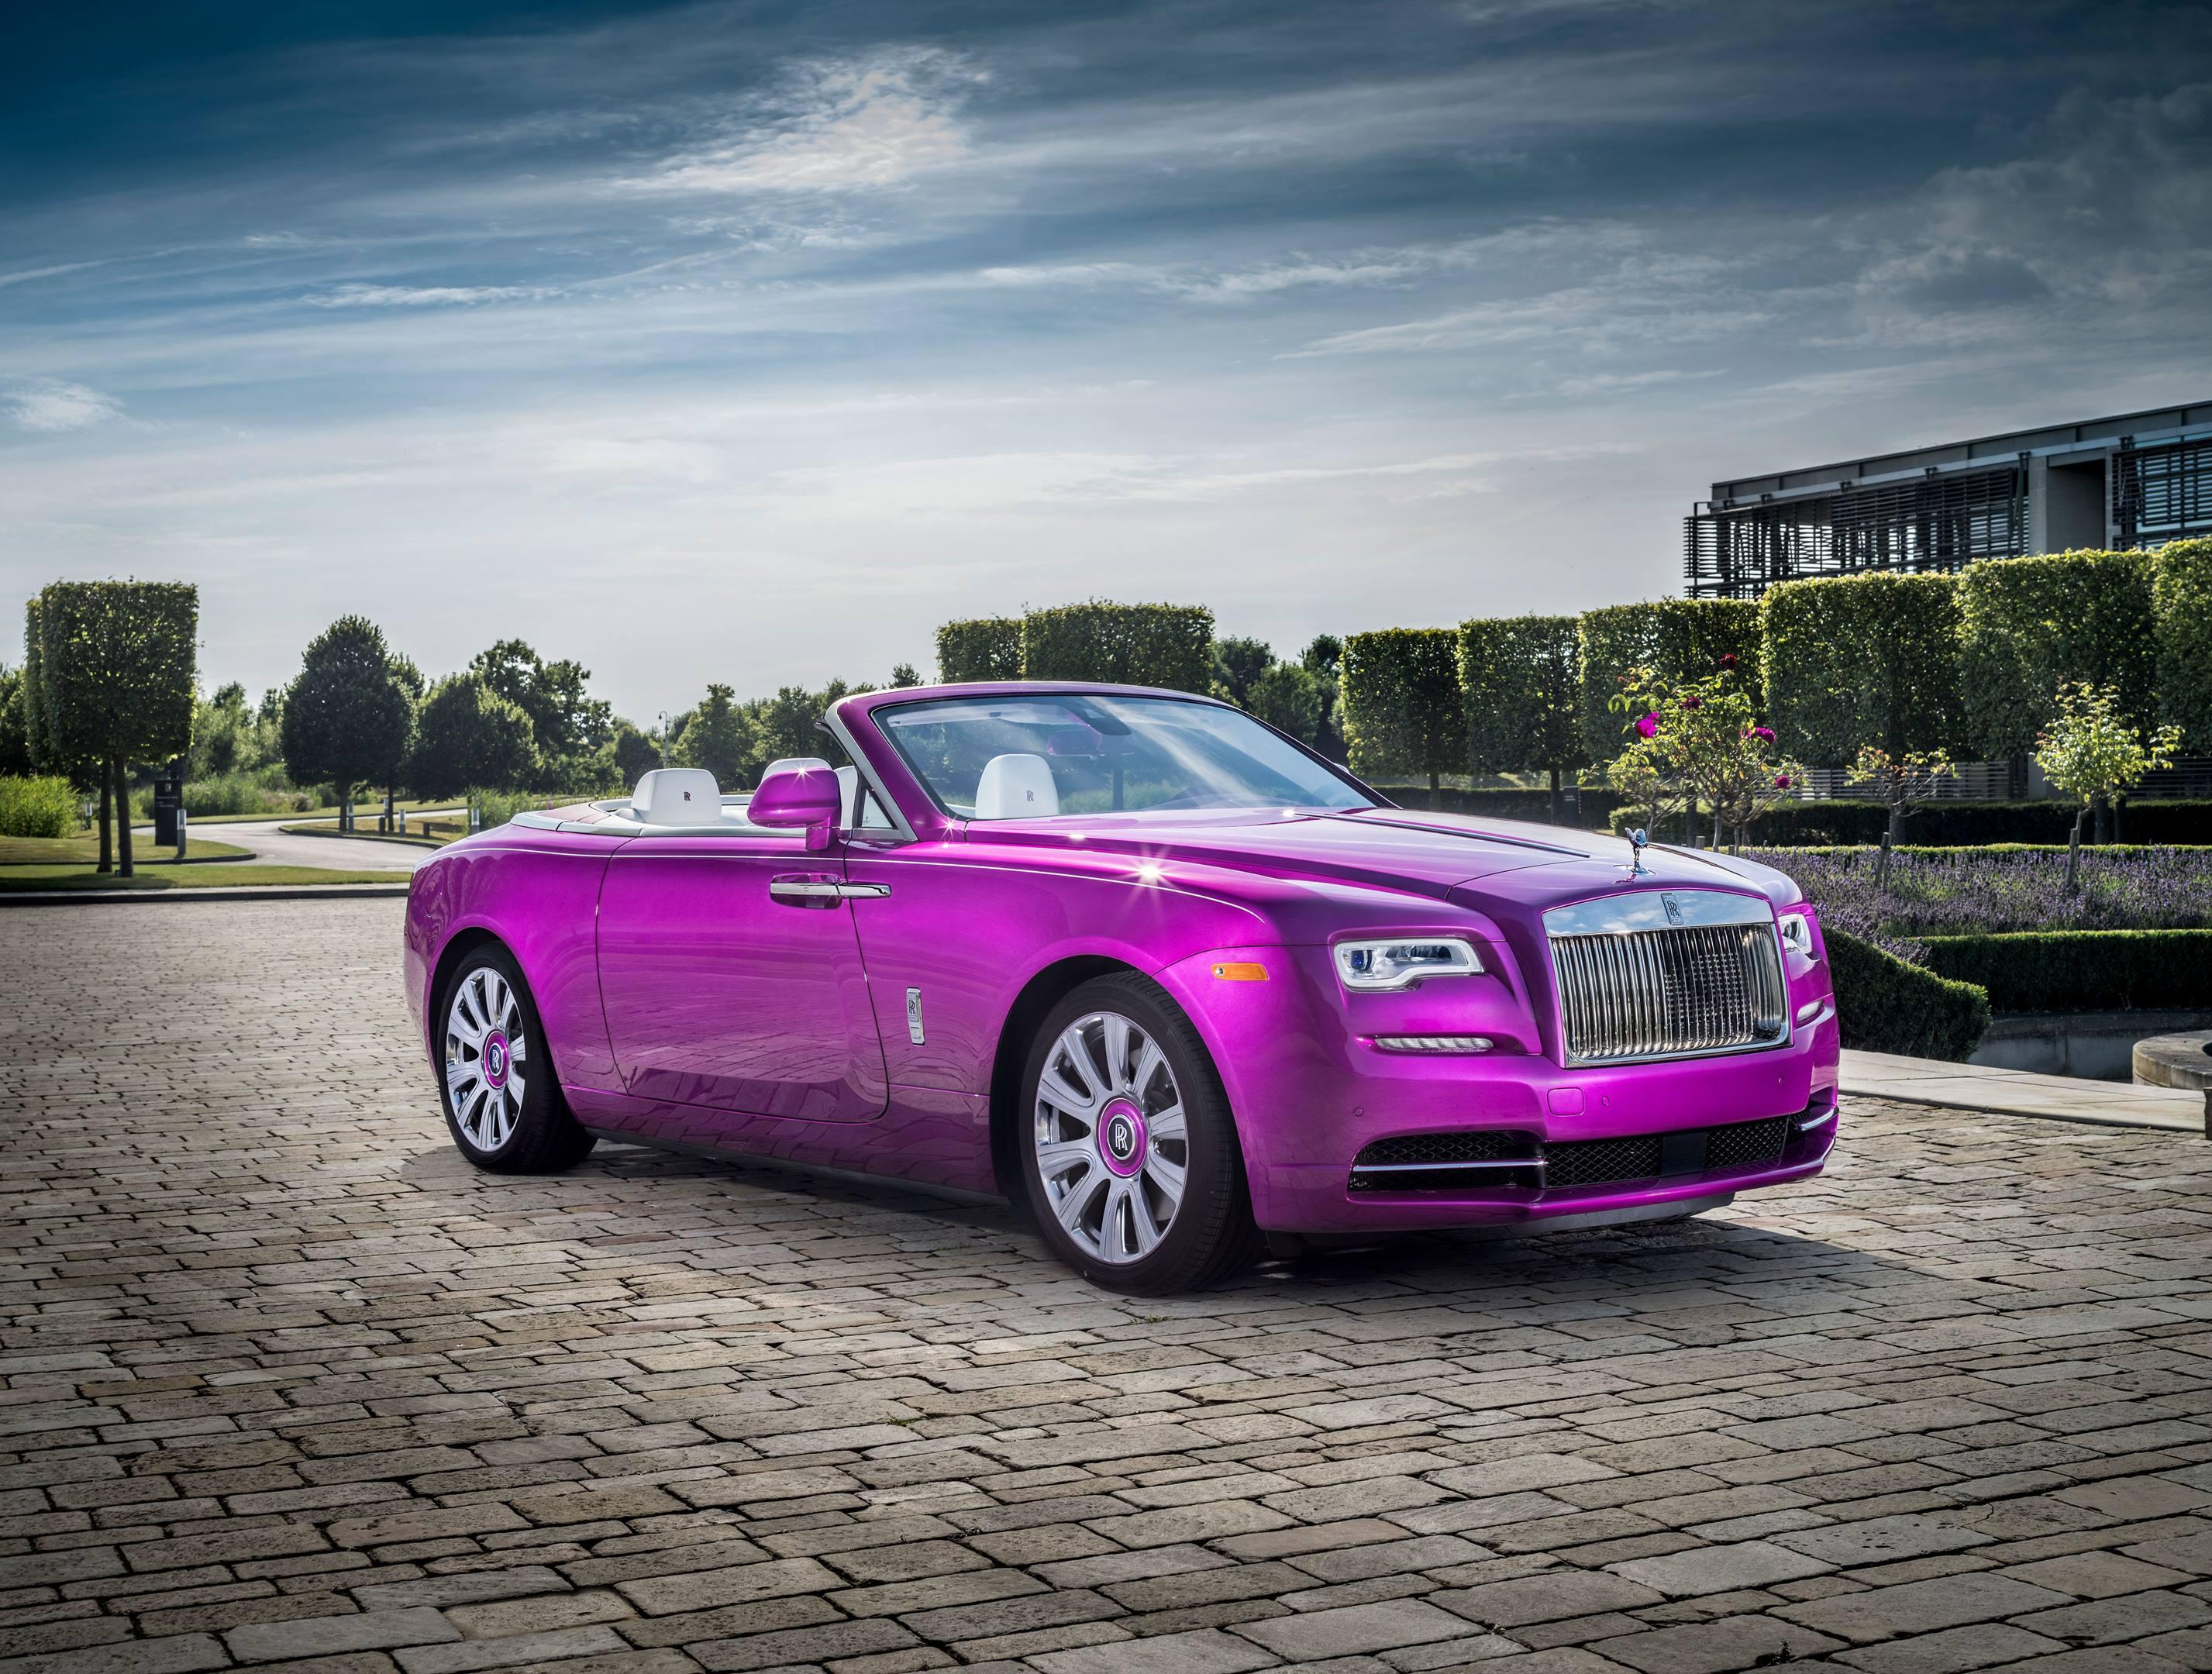 Michael Fux's Rolls-Royce Dawn convertible